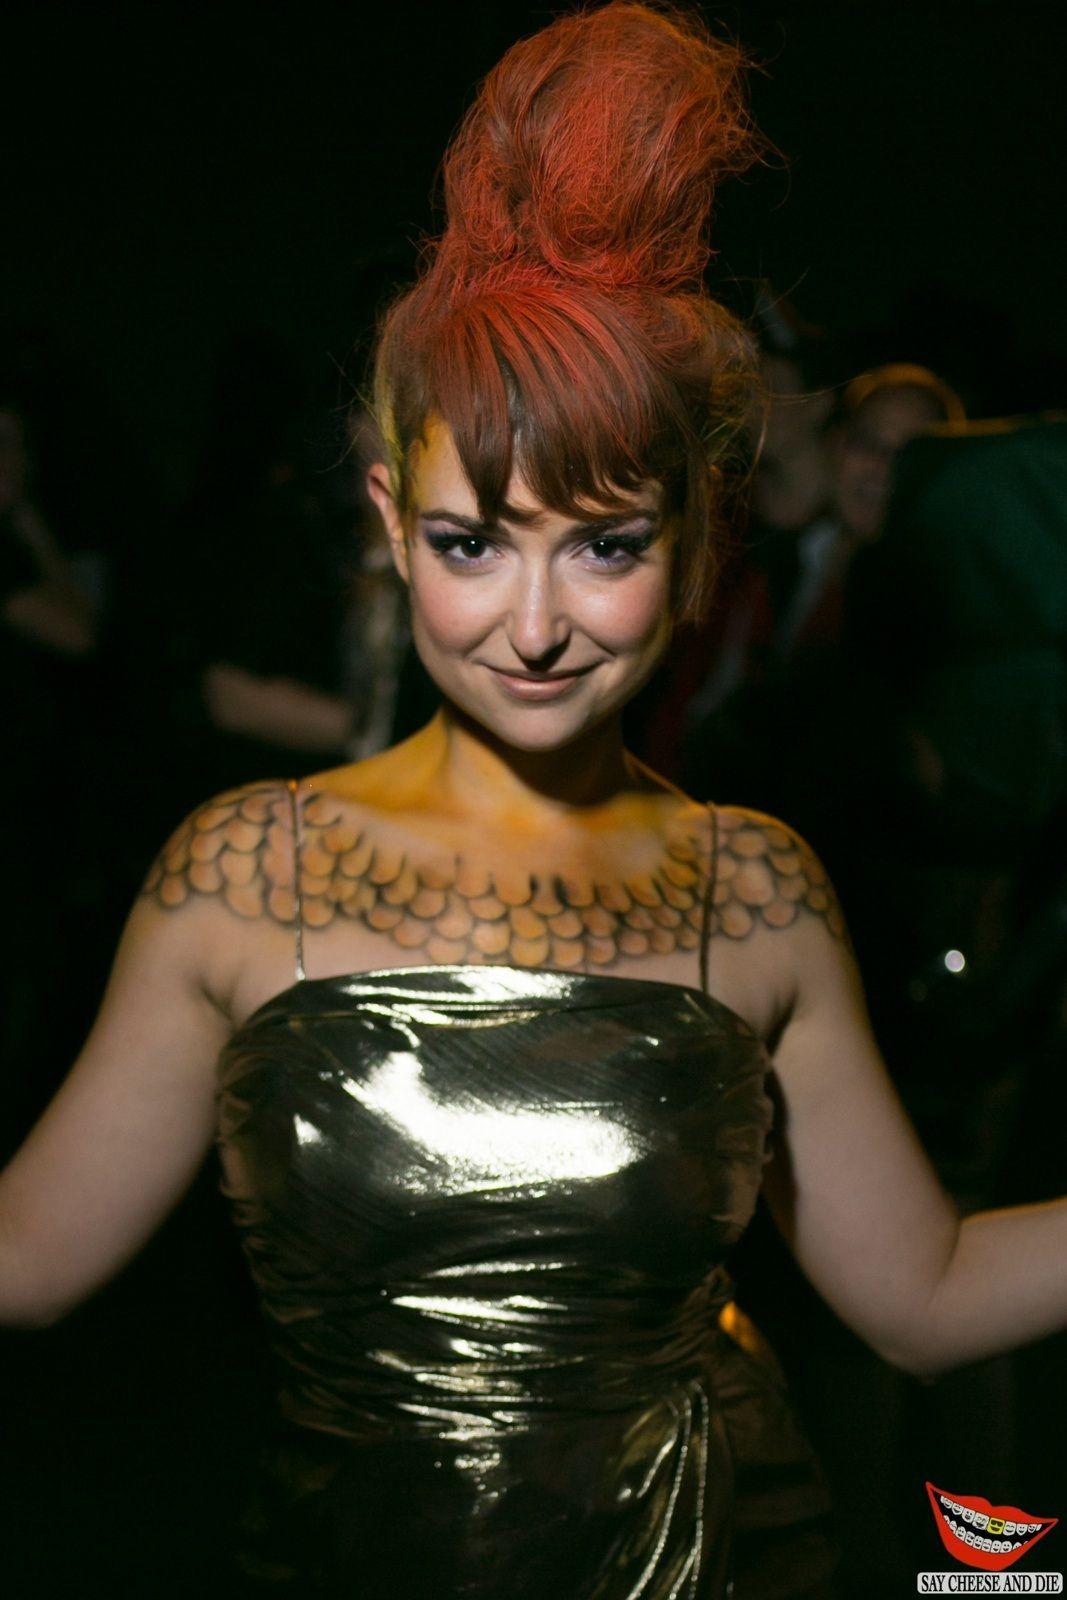 Milana Vayntrub At Halloween Party In Los Angeles | Milana ...